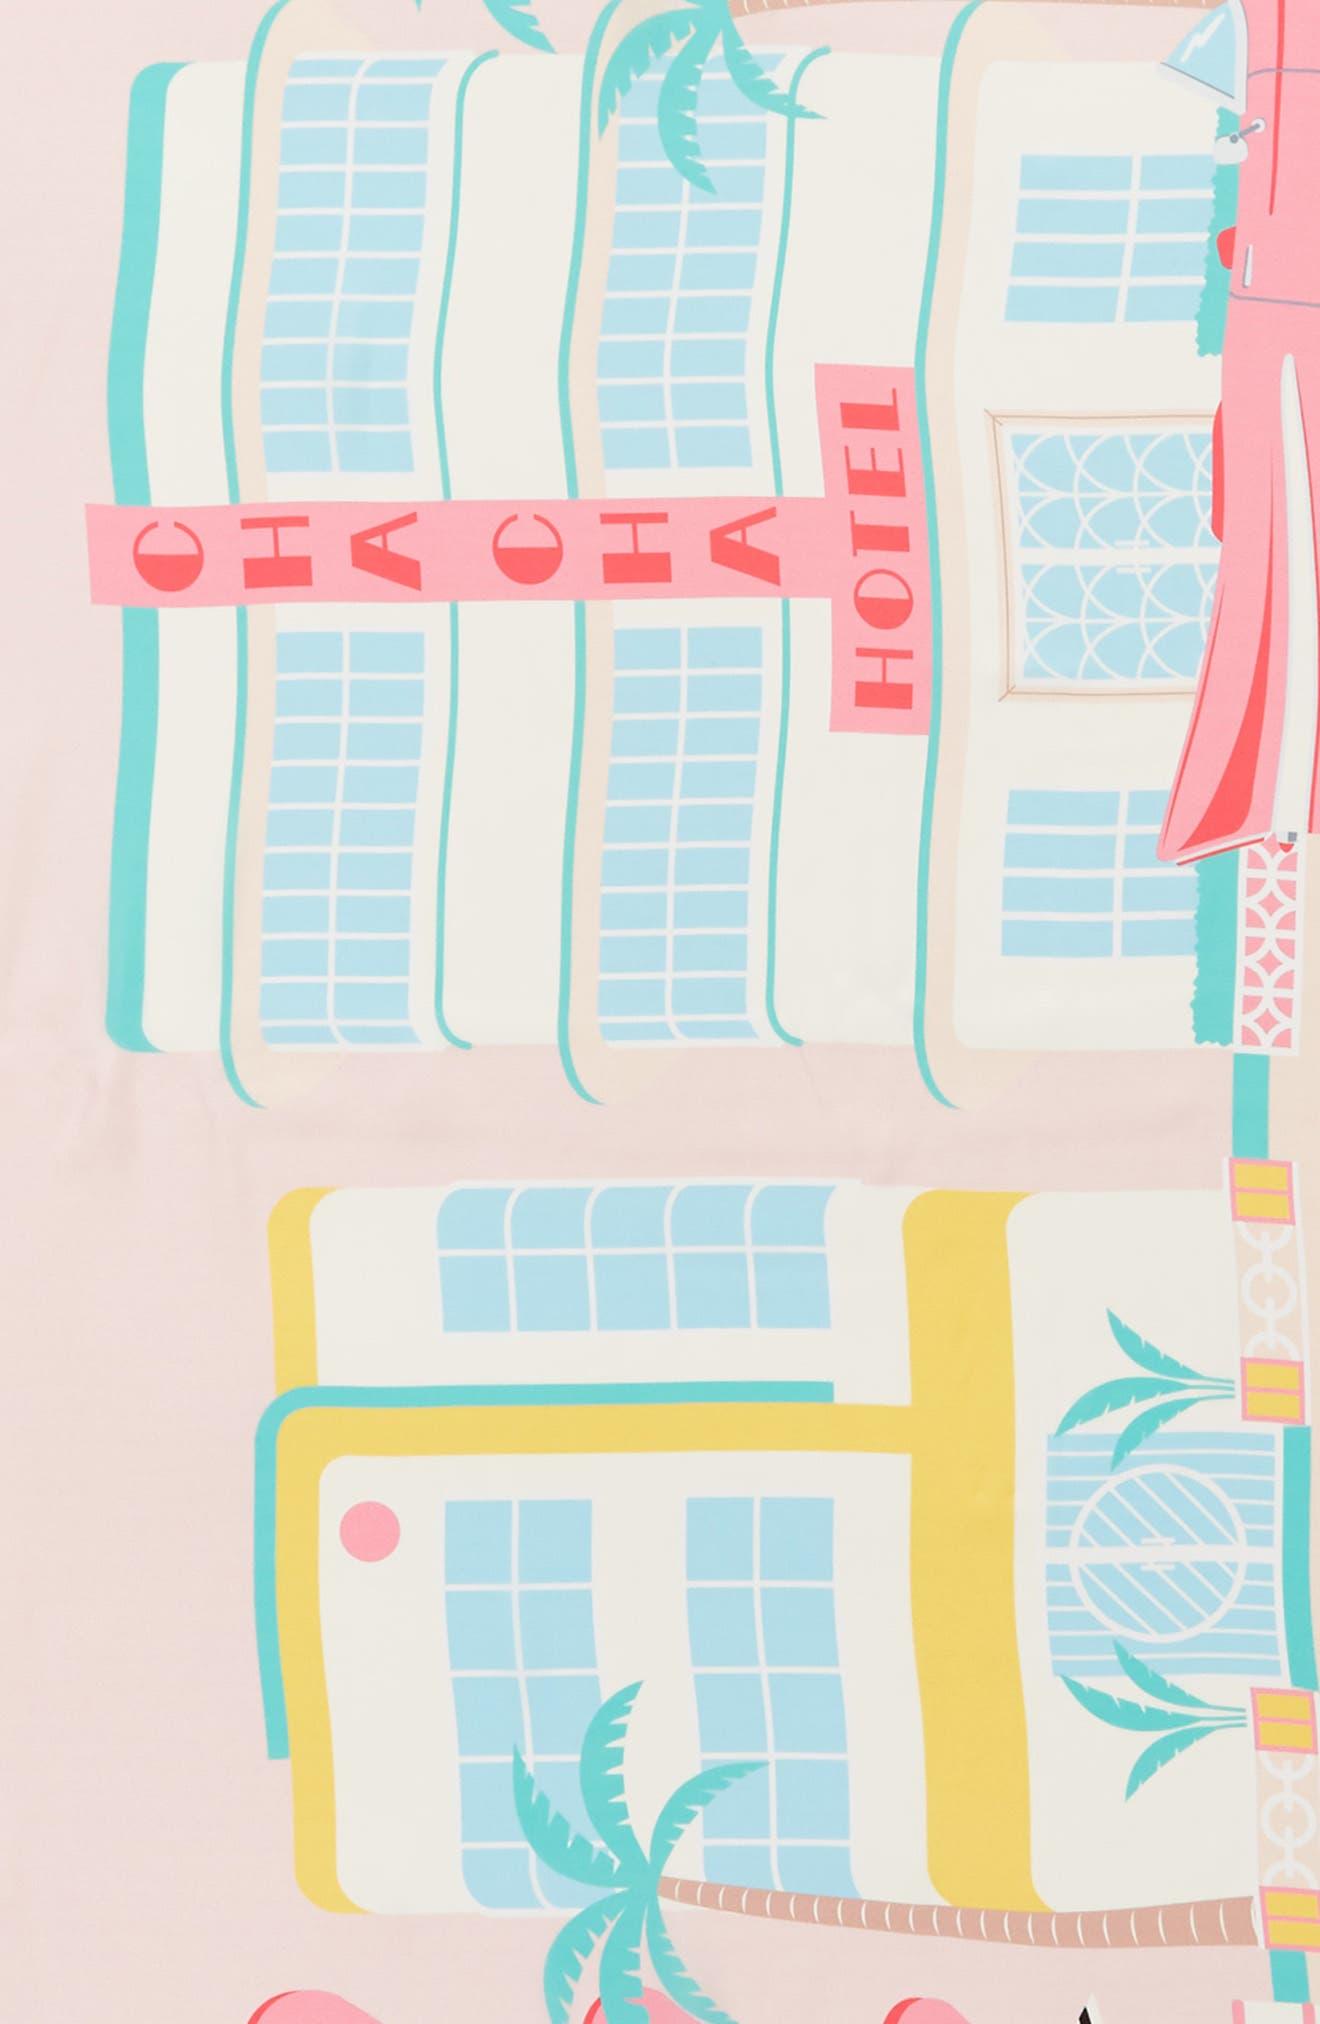 deco hotel oblong silk scarf,                             Alternate thumbnail 4, color,                             Valentine Pink